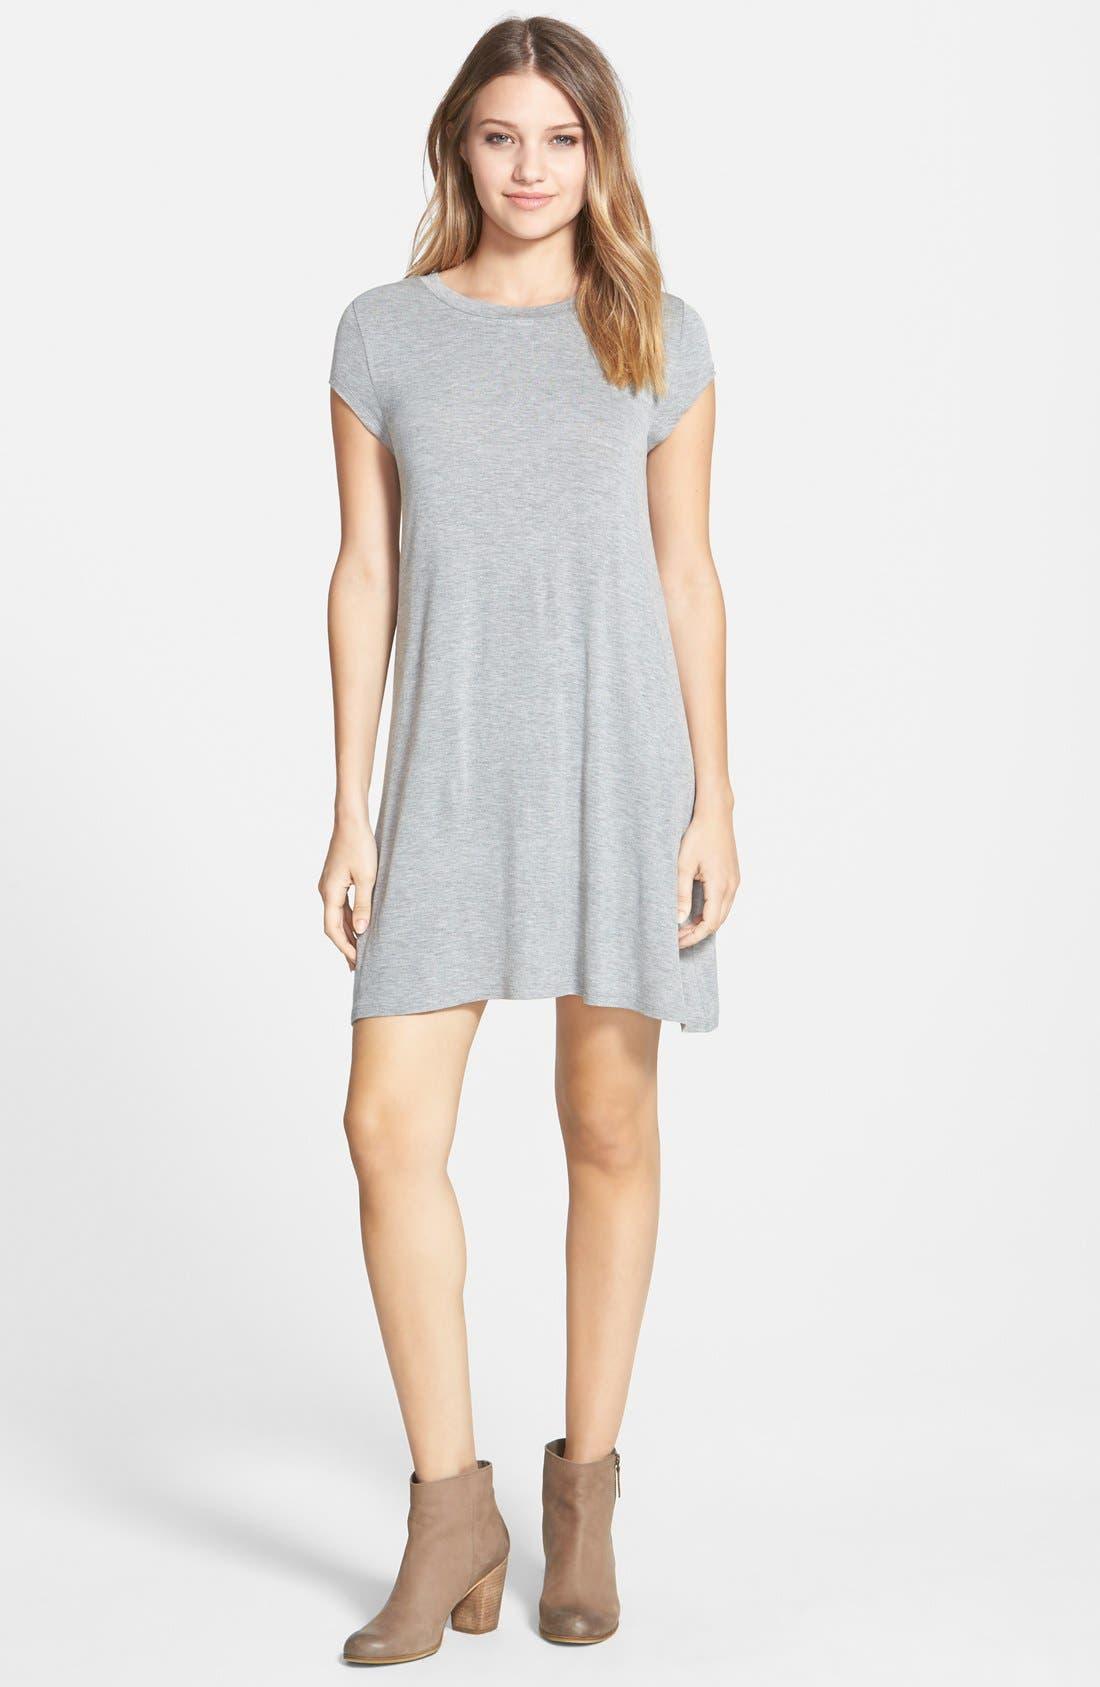 Main Image - Billabong 'Last Minute' T-Shirt Dress